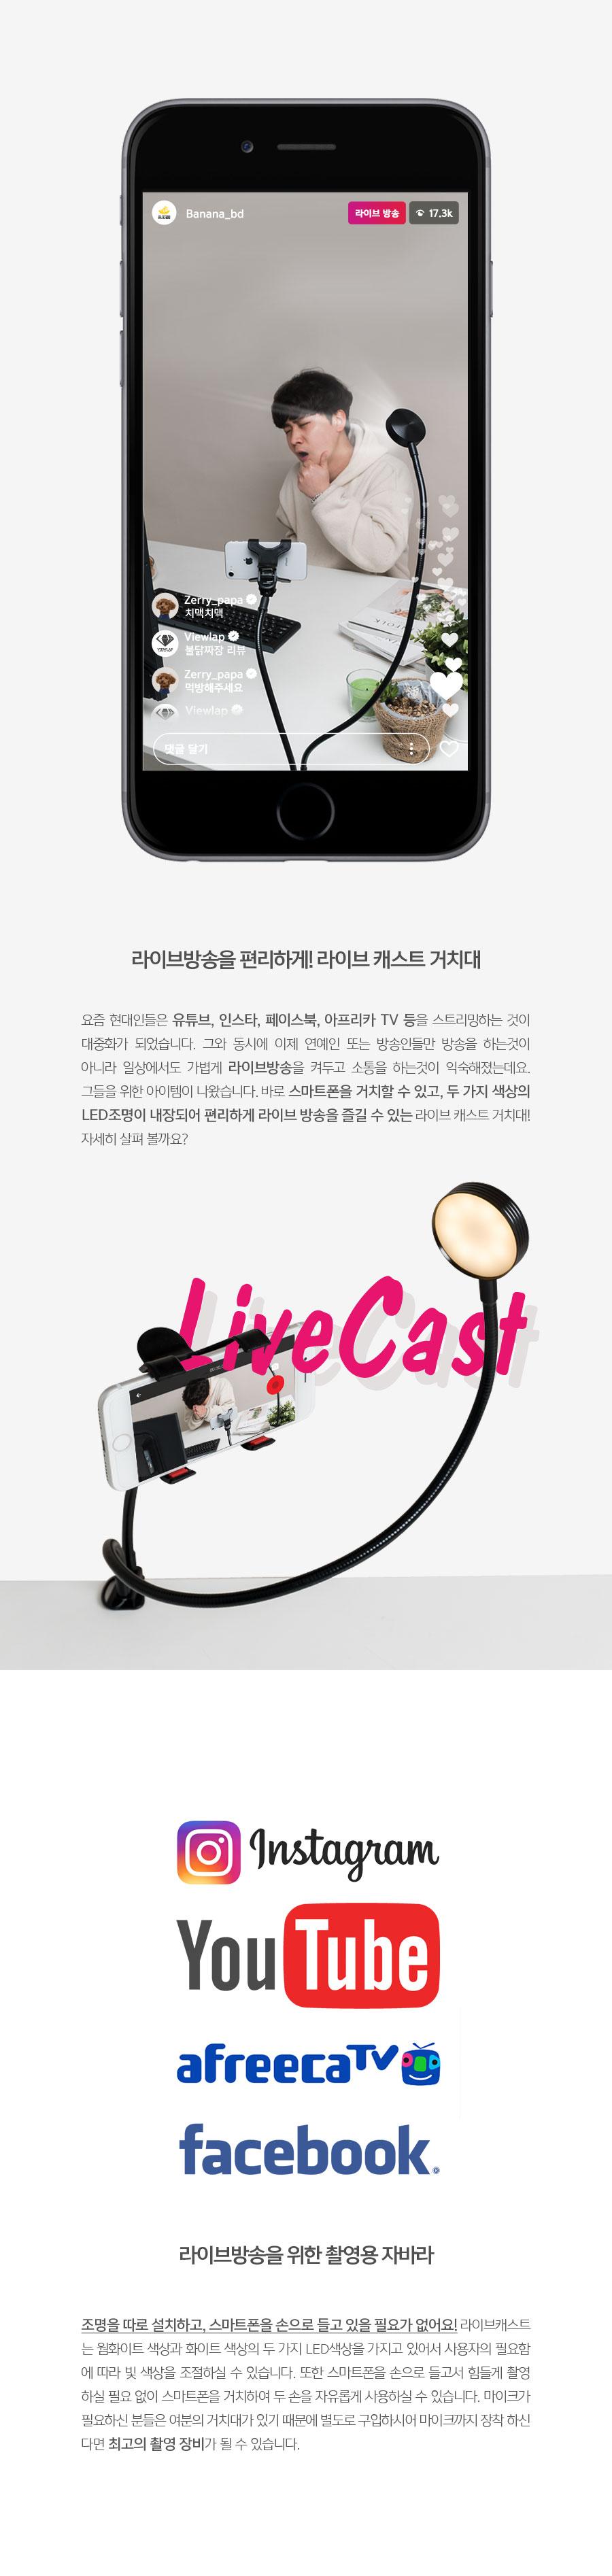 Livecast_01.jpg